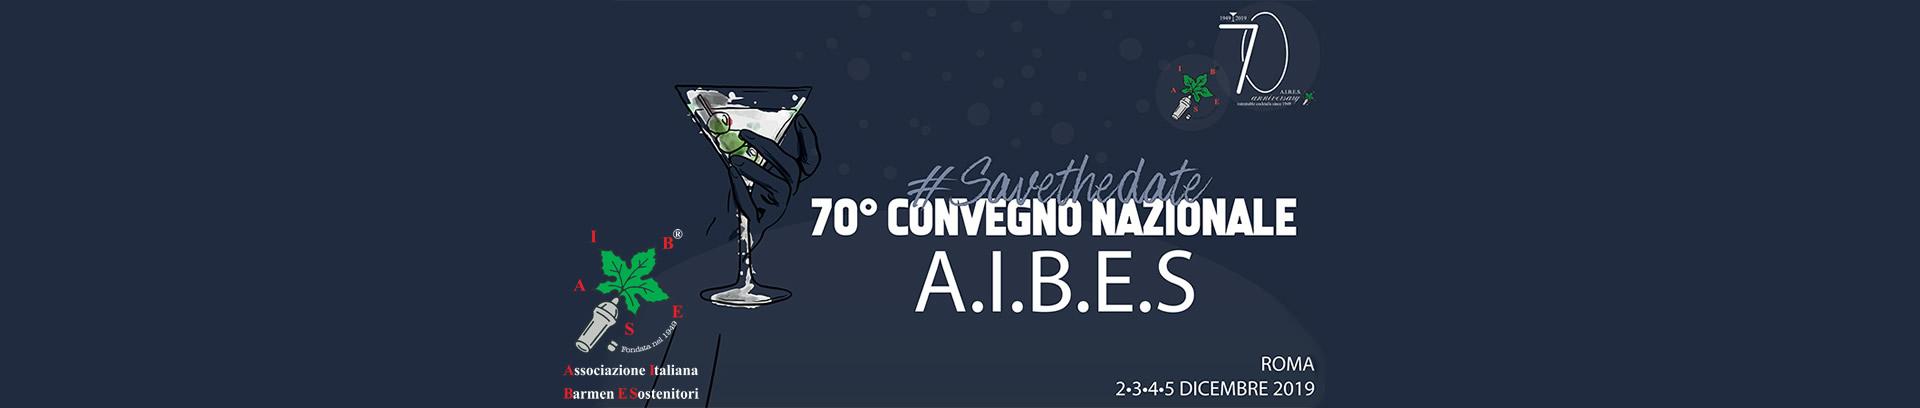 Copertina-AIBES-Save-The-Date